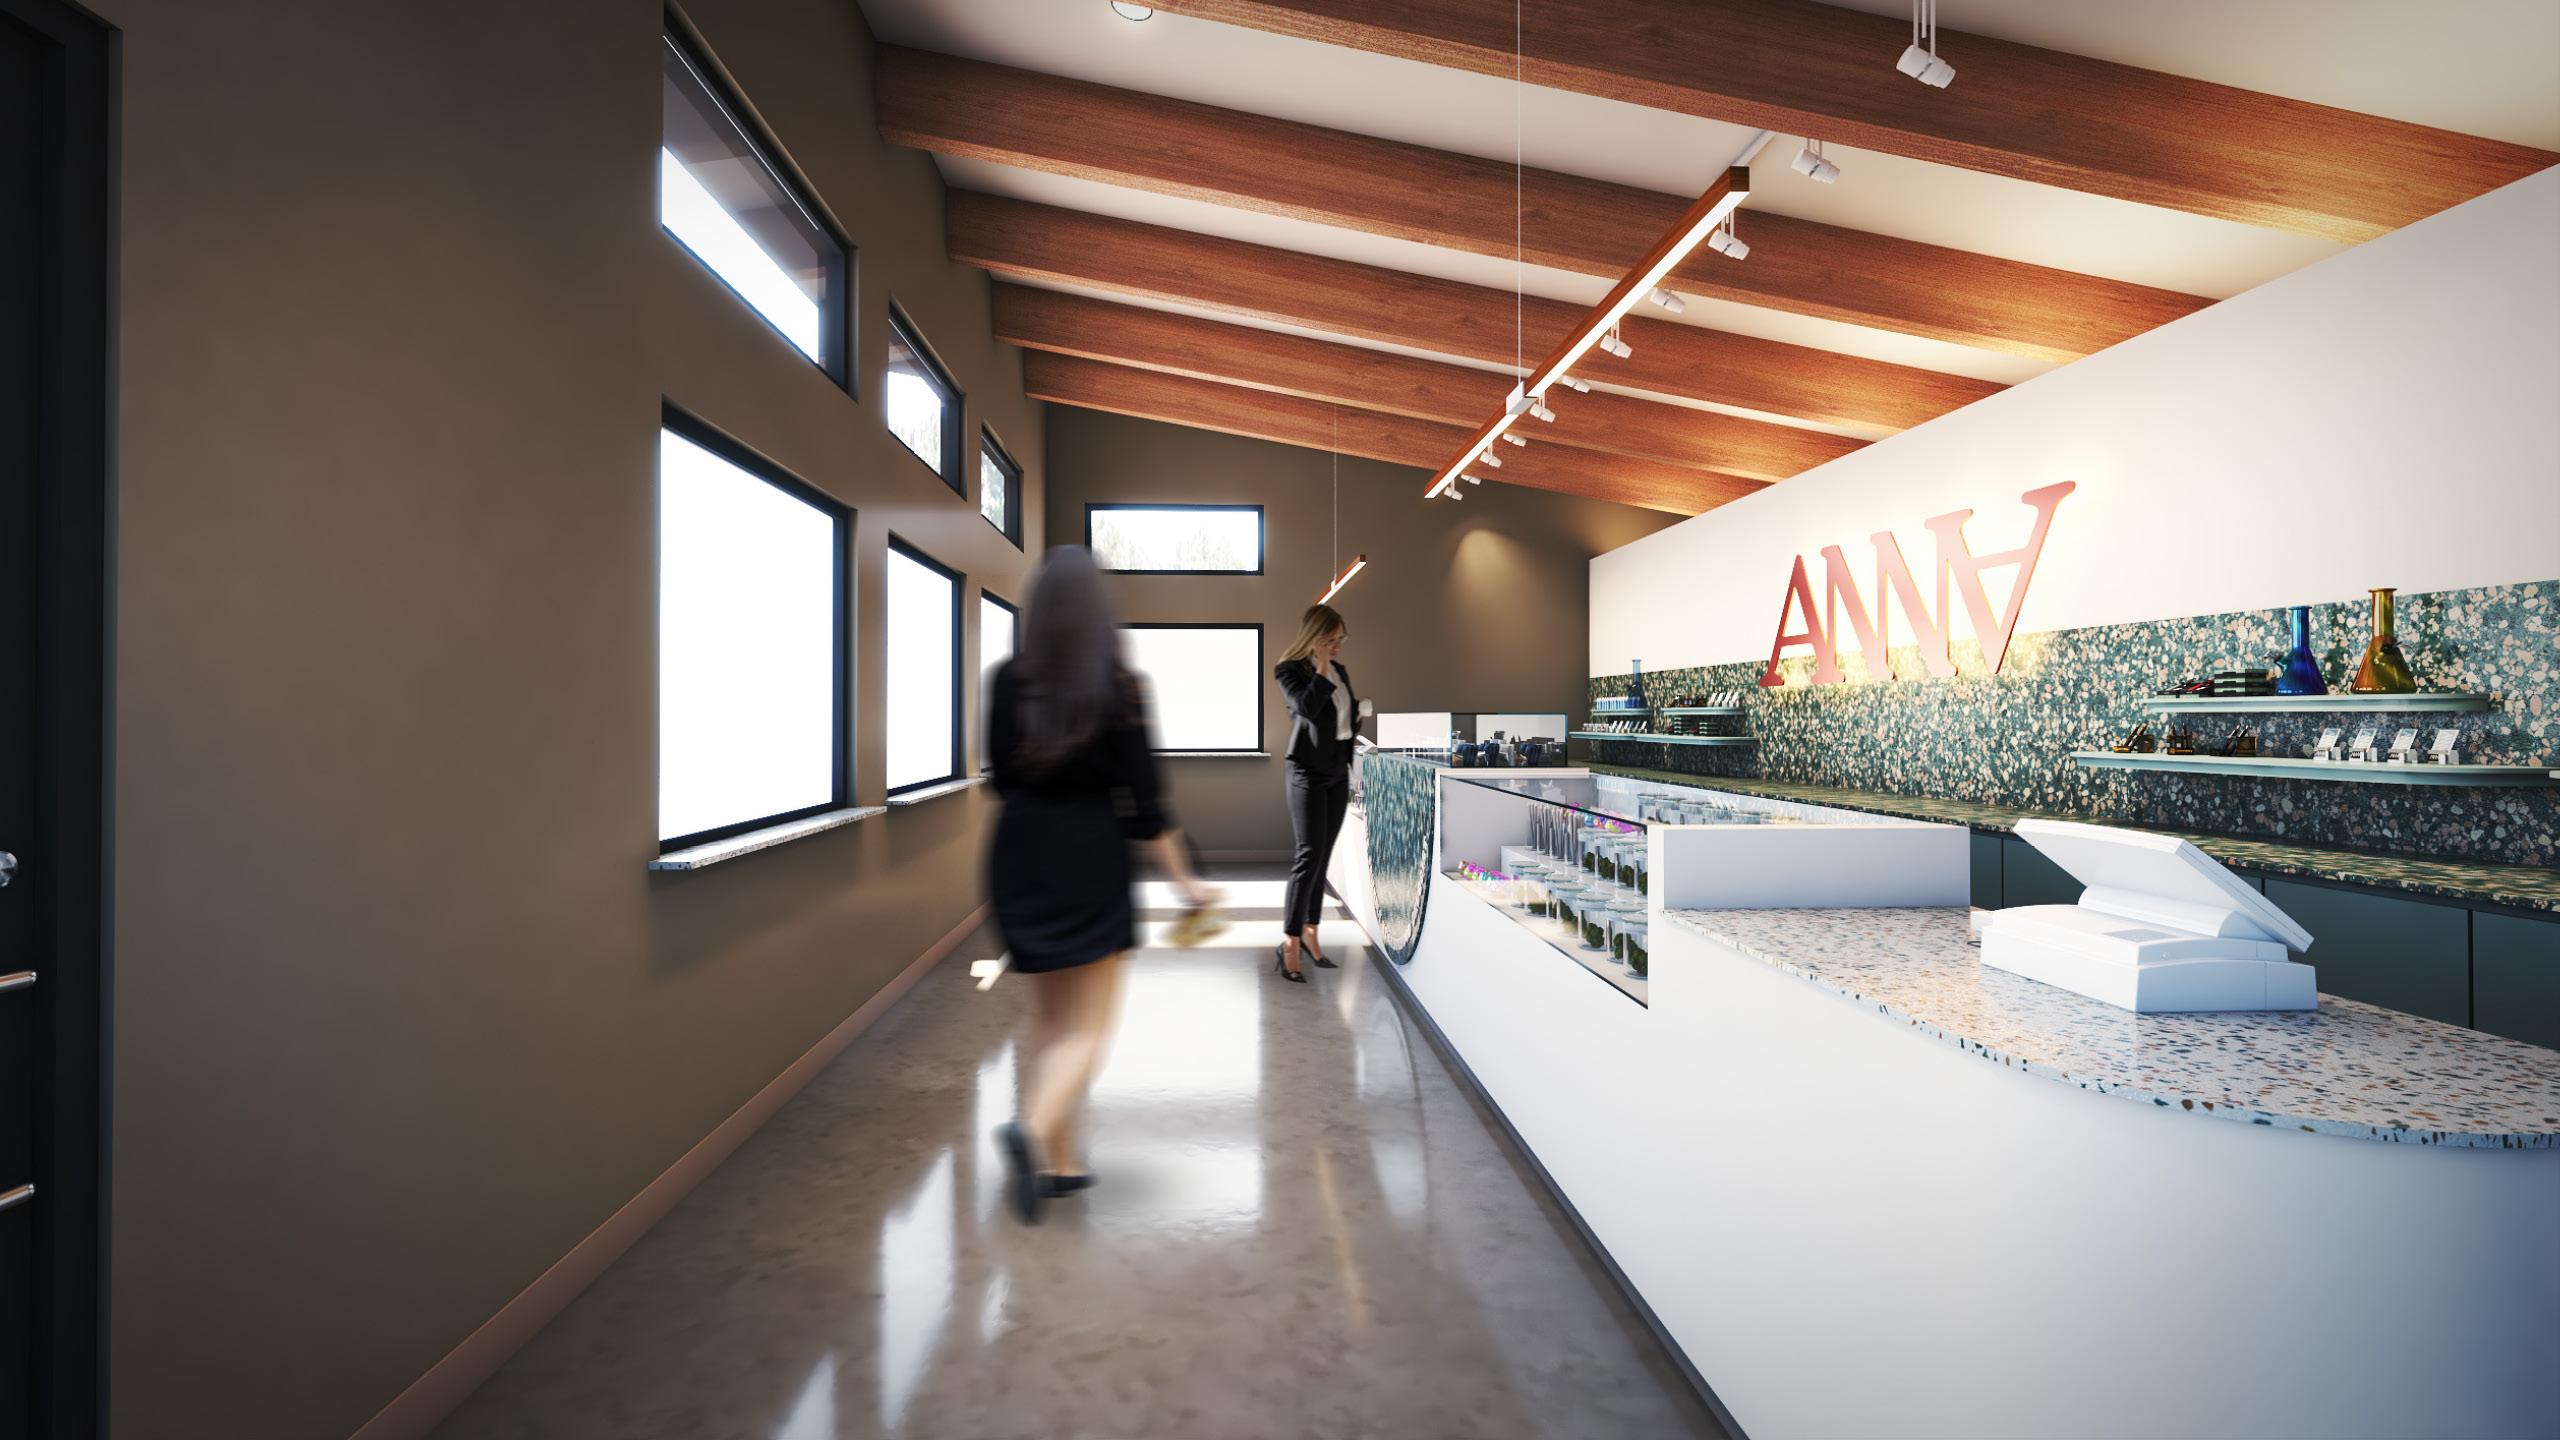 Anna - Coming Soon - High Road Studio